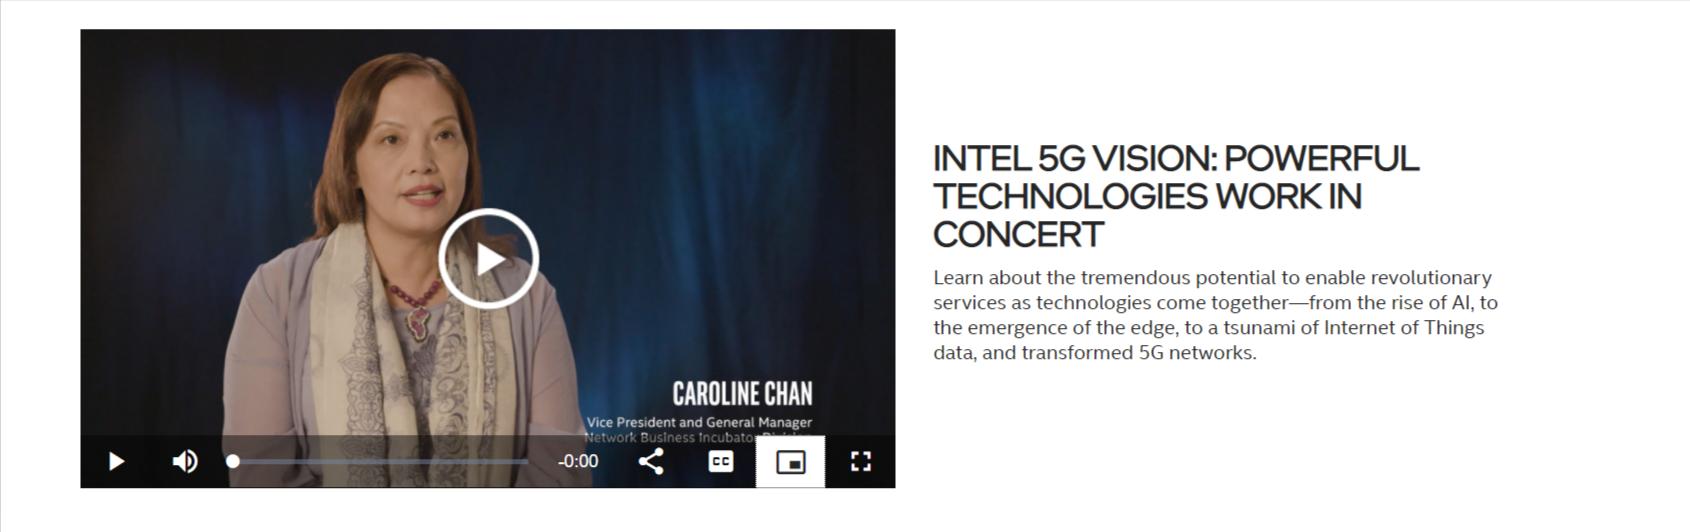 5g Technology by Intel